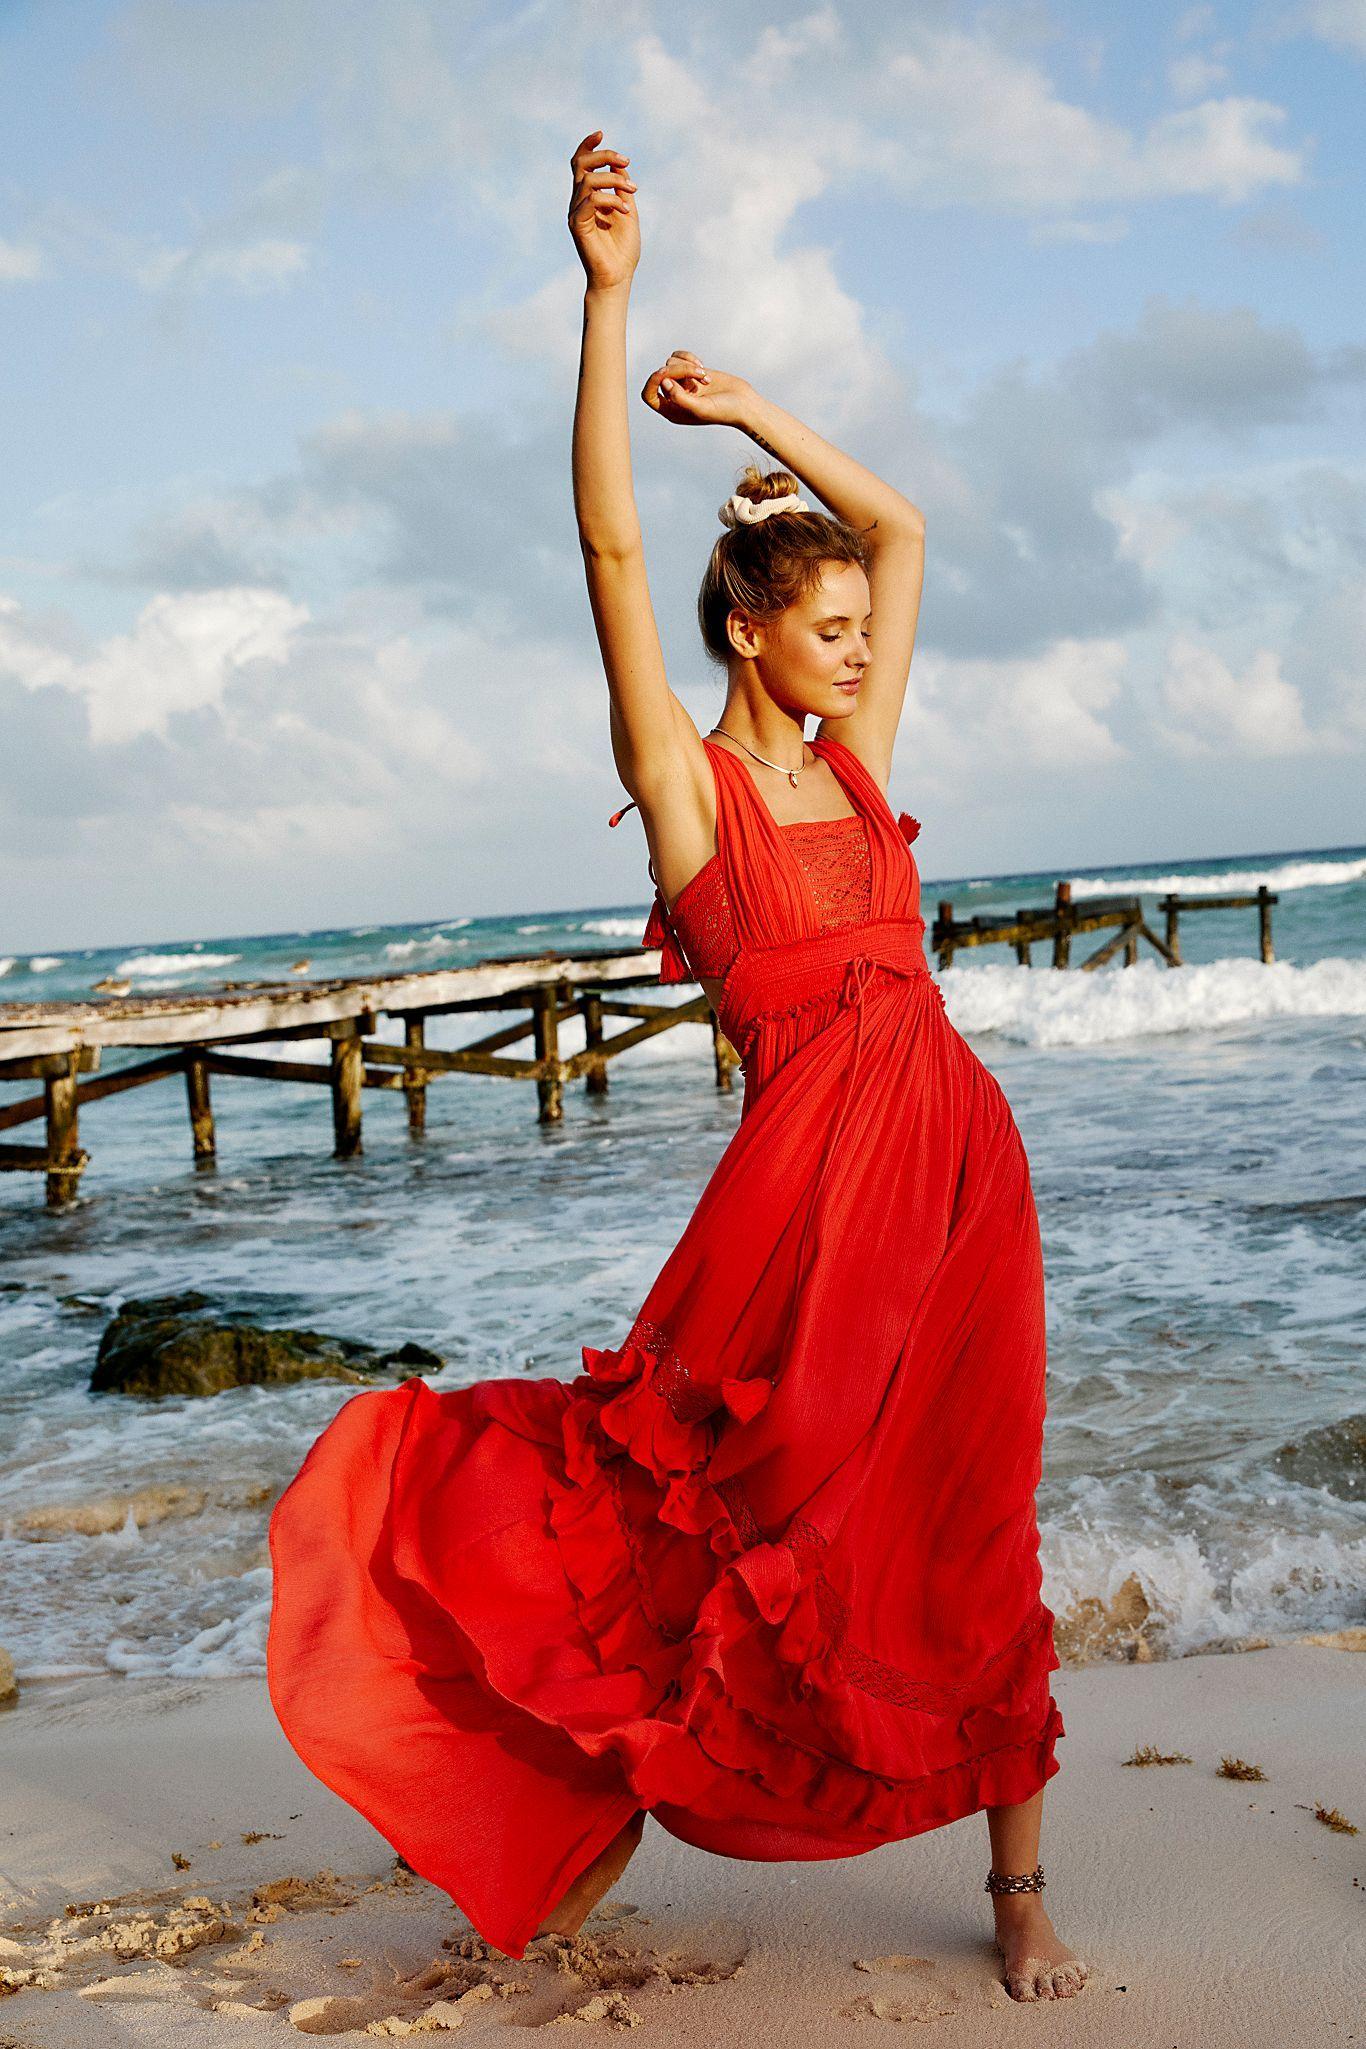 Santa Maria Maxi Dress Maxi Dress Maxi Dress Summer Beach Lace Maxi Dress [ 2049 x 1366 Pixel ]